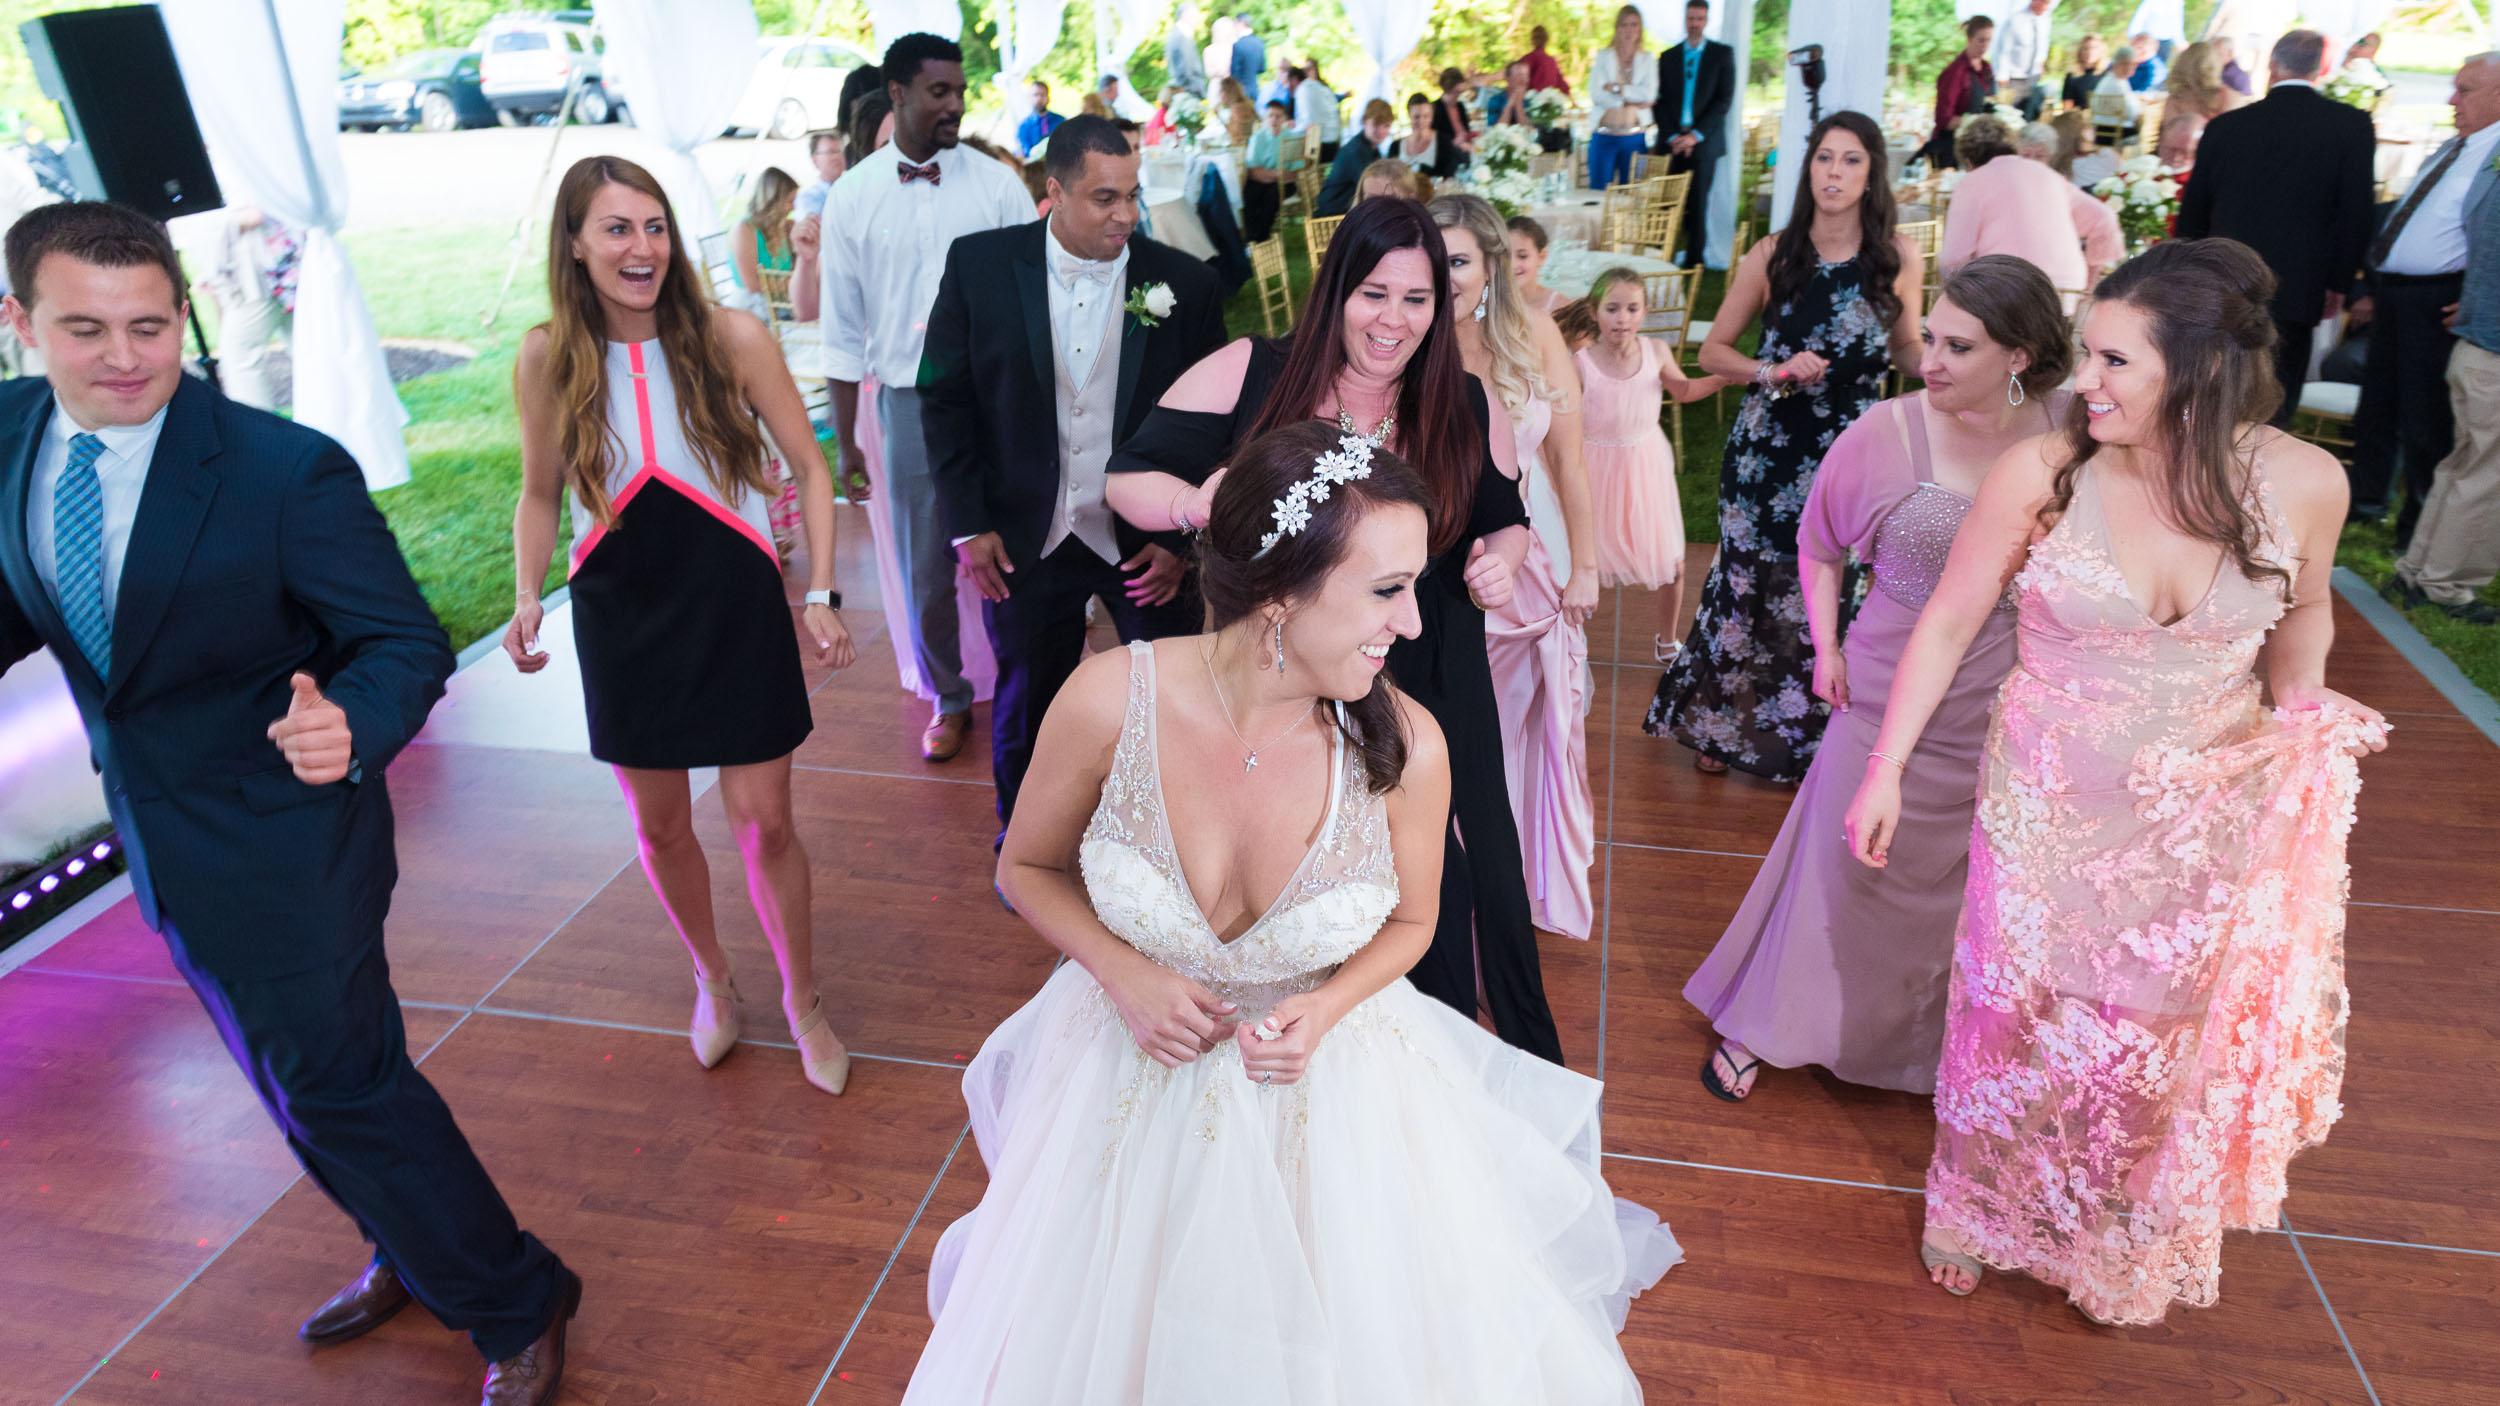 dancing-at-wedding-reception-3.jpg